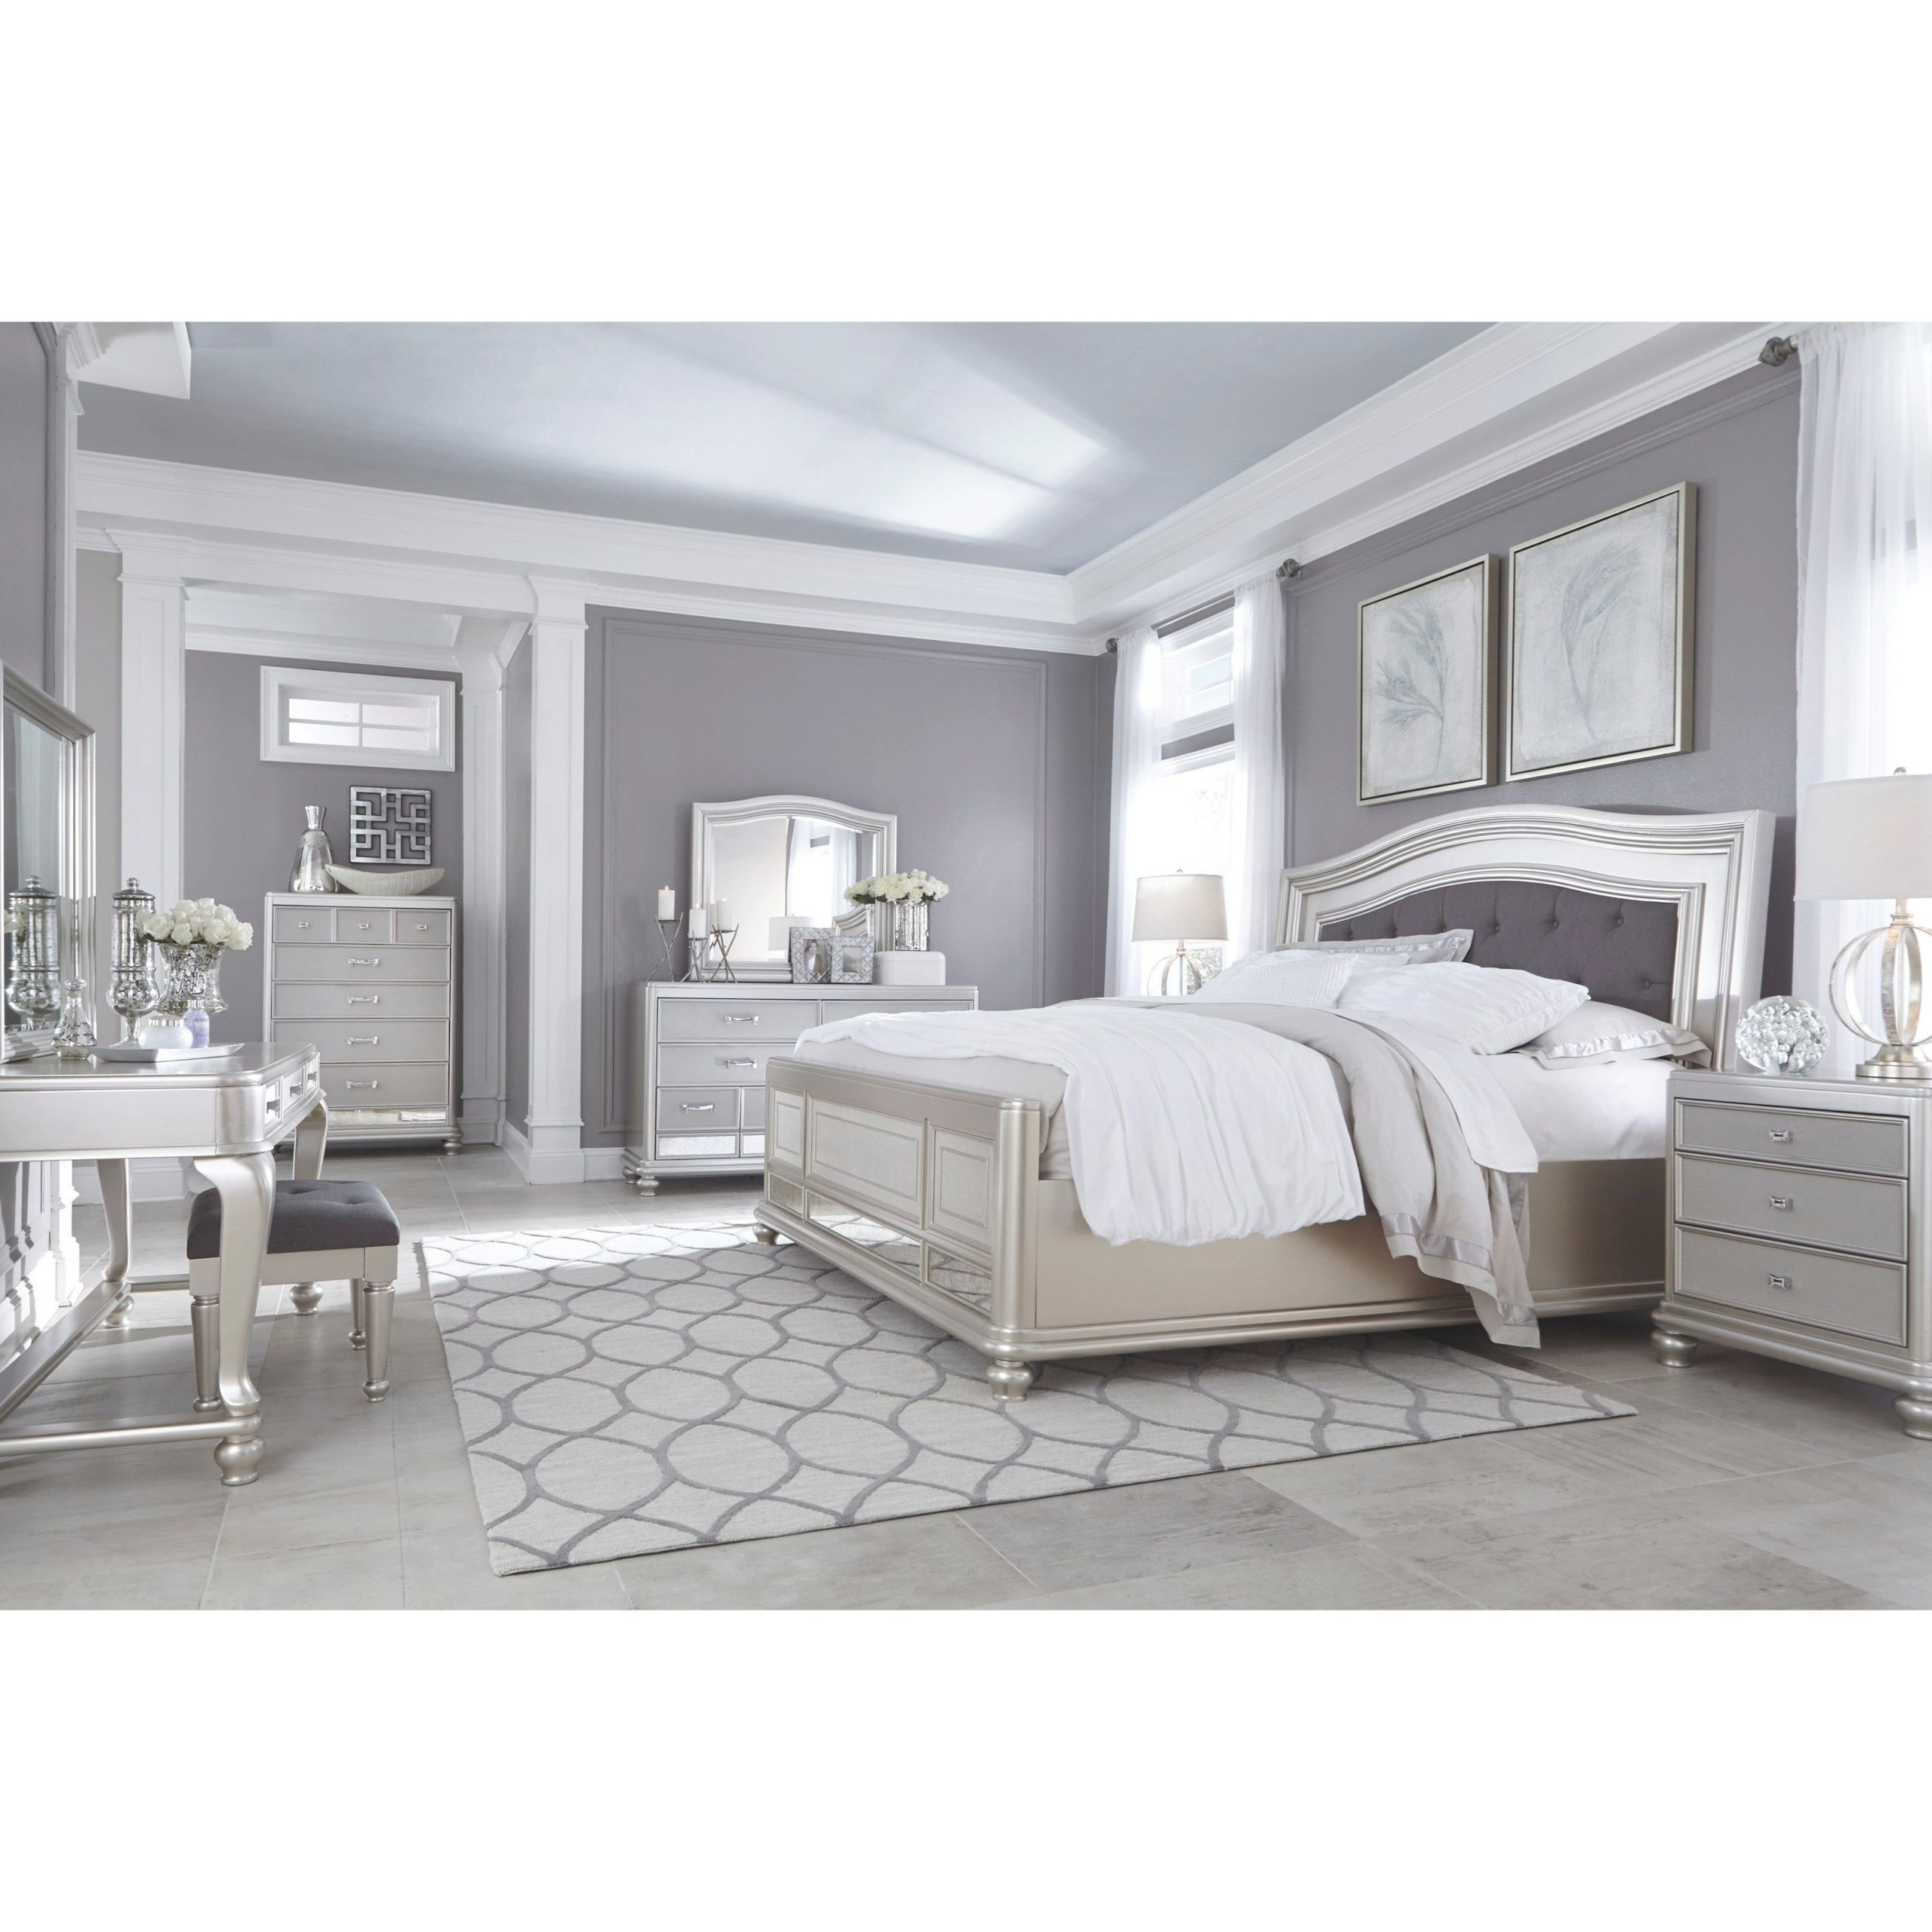 Coralayne King Bedroom Groupsignature Designashley for Bedroom Set Ideas